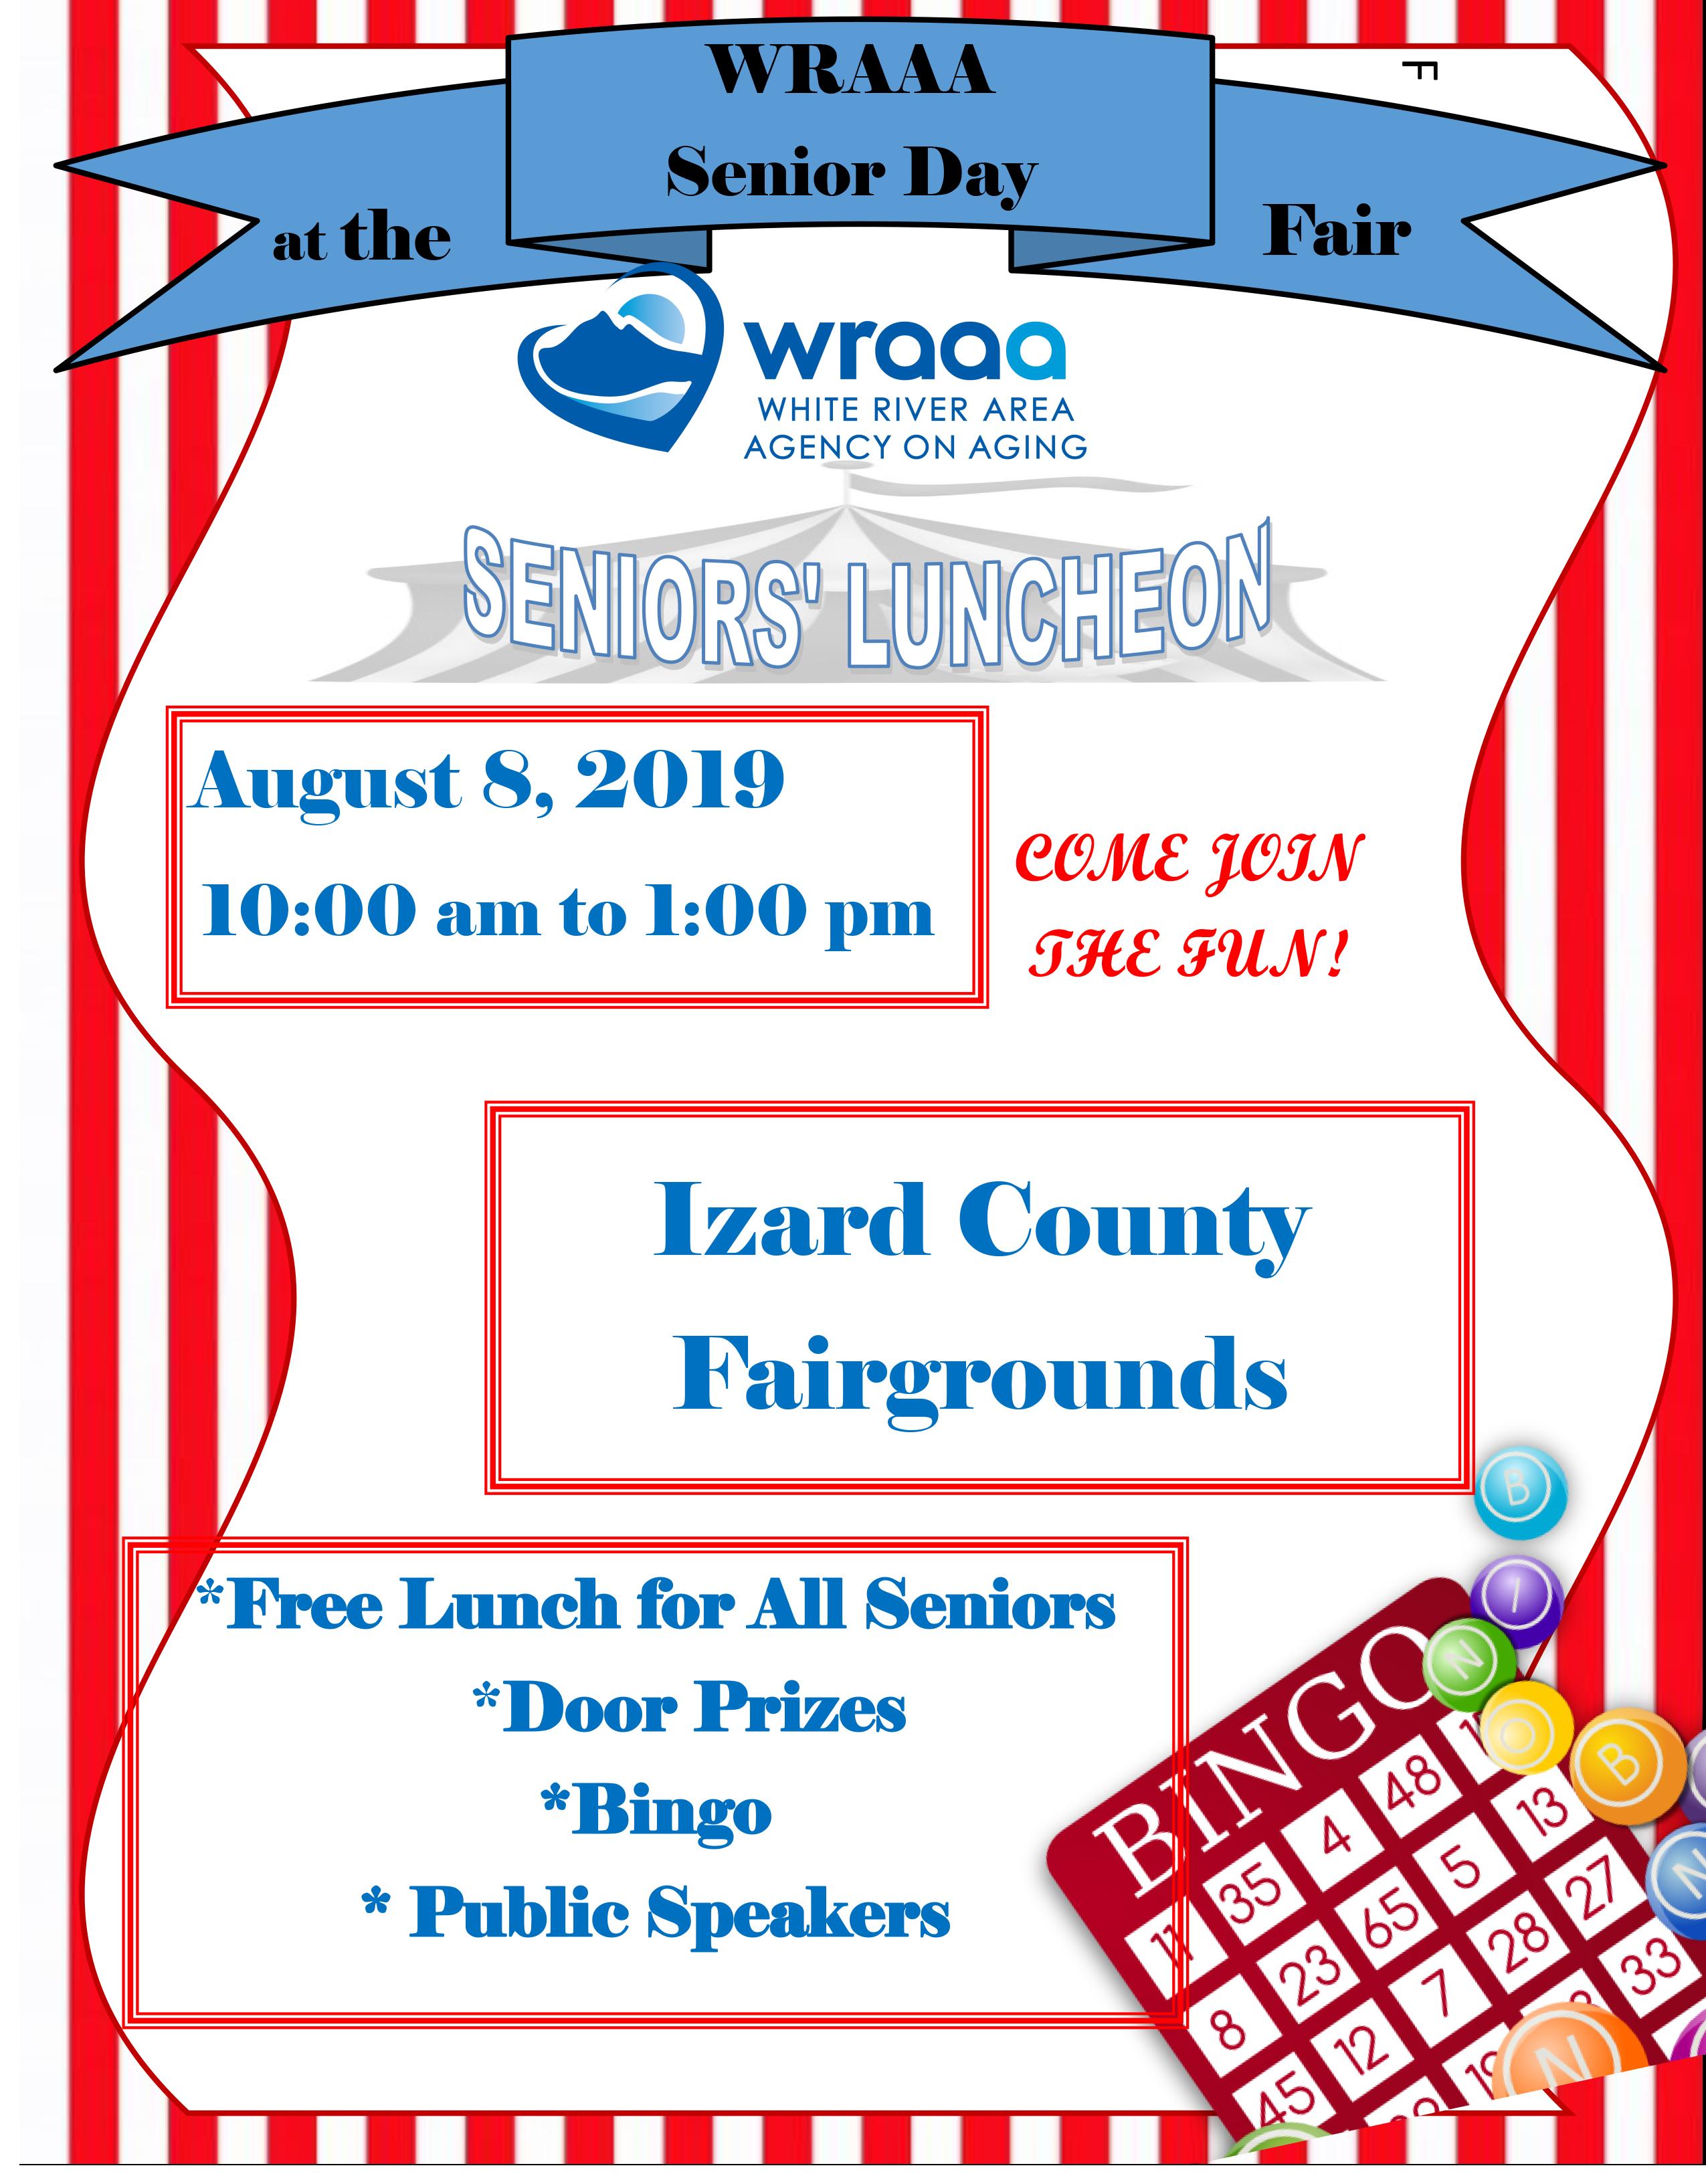 Izard County Senior Day at the fair 2019